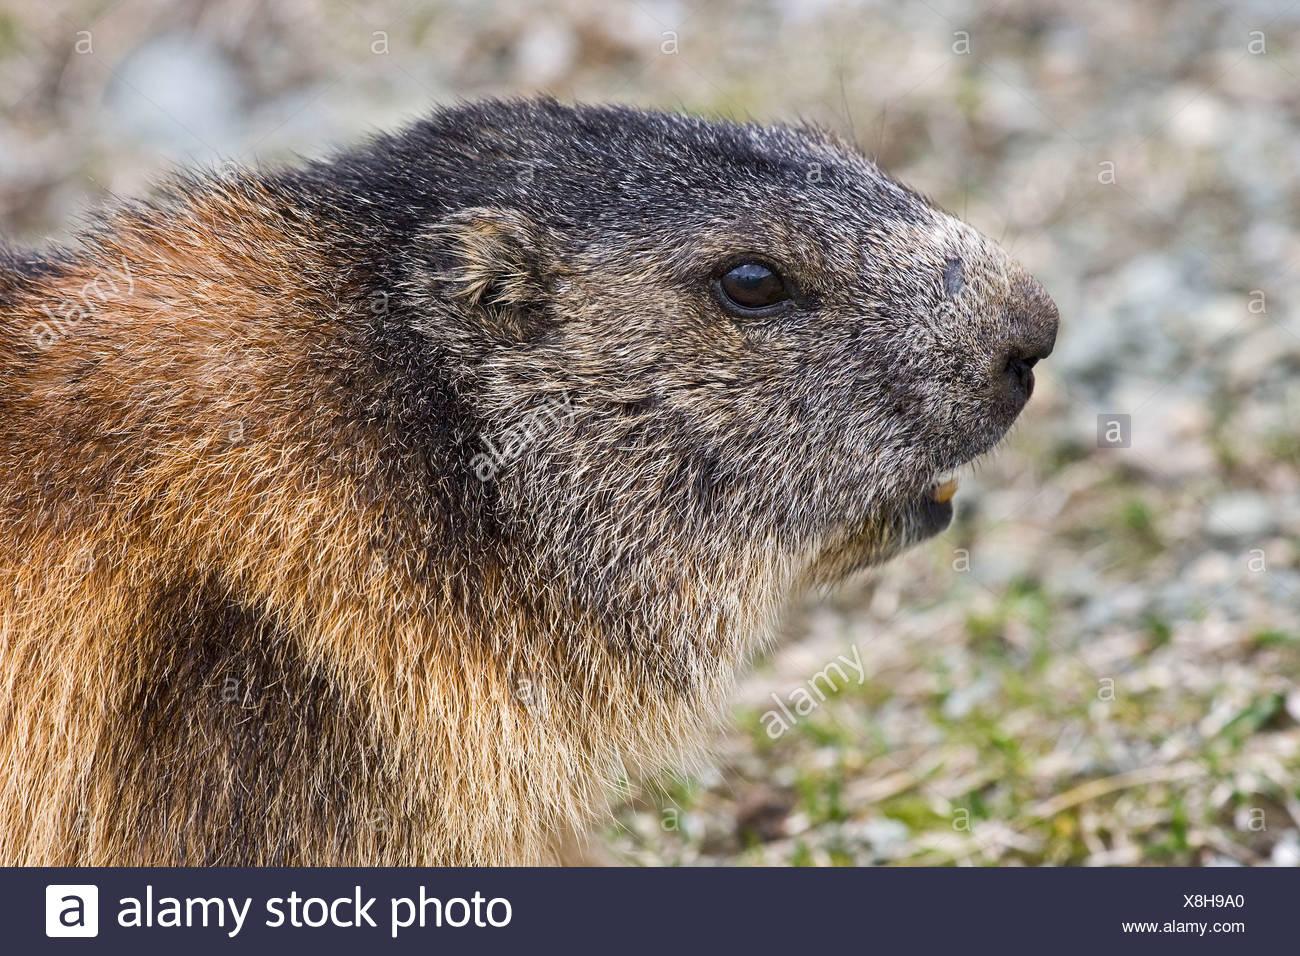 Alpine marmot - Stock Image